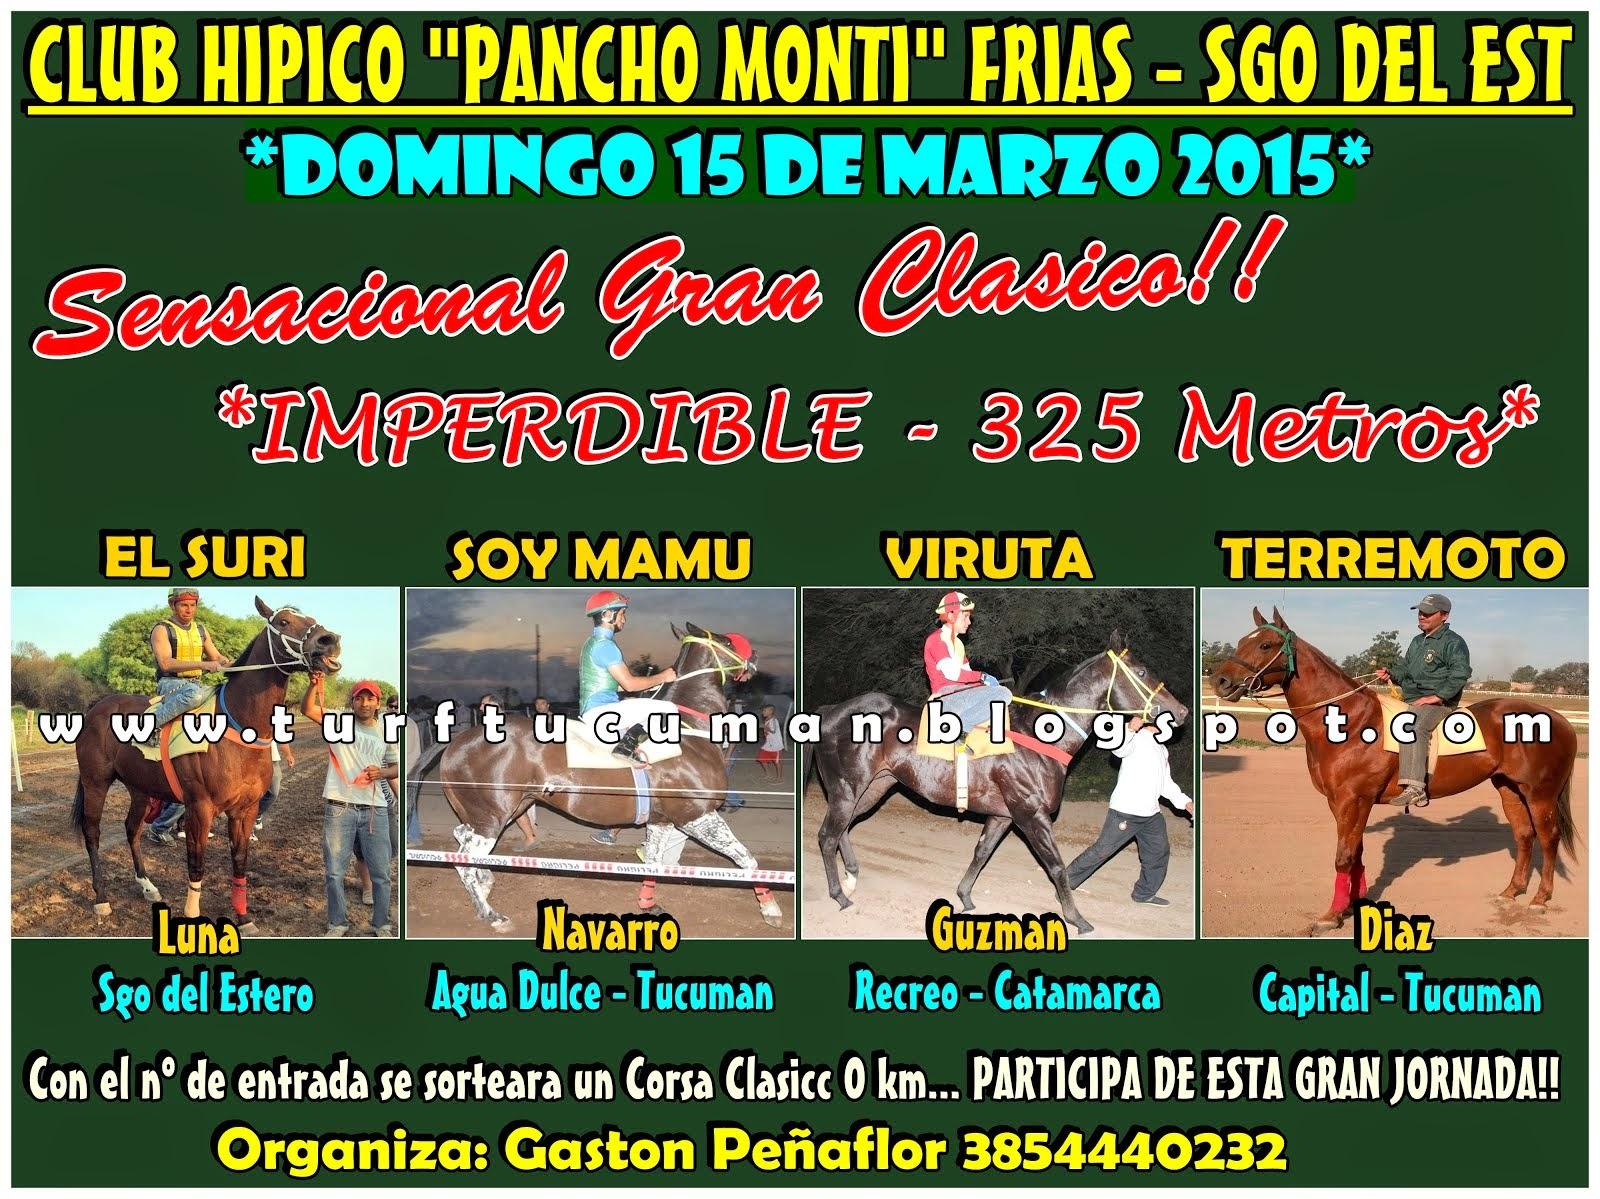 CLASICO PRINC FRIAS